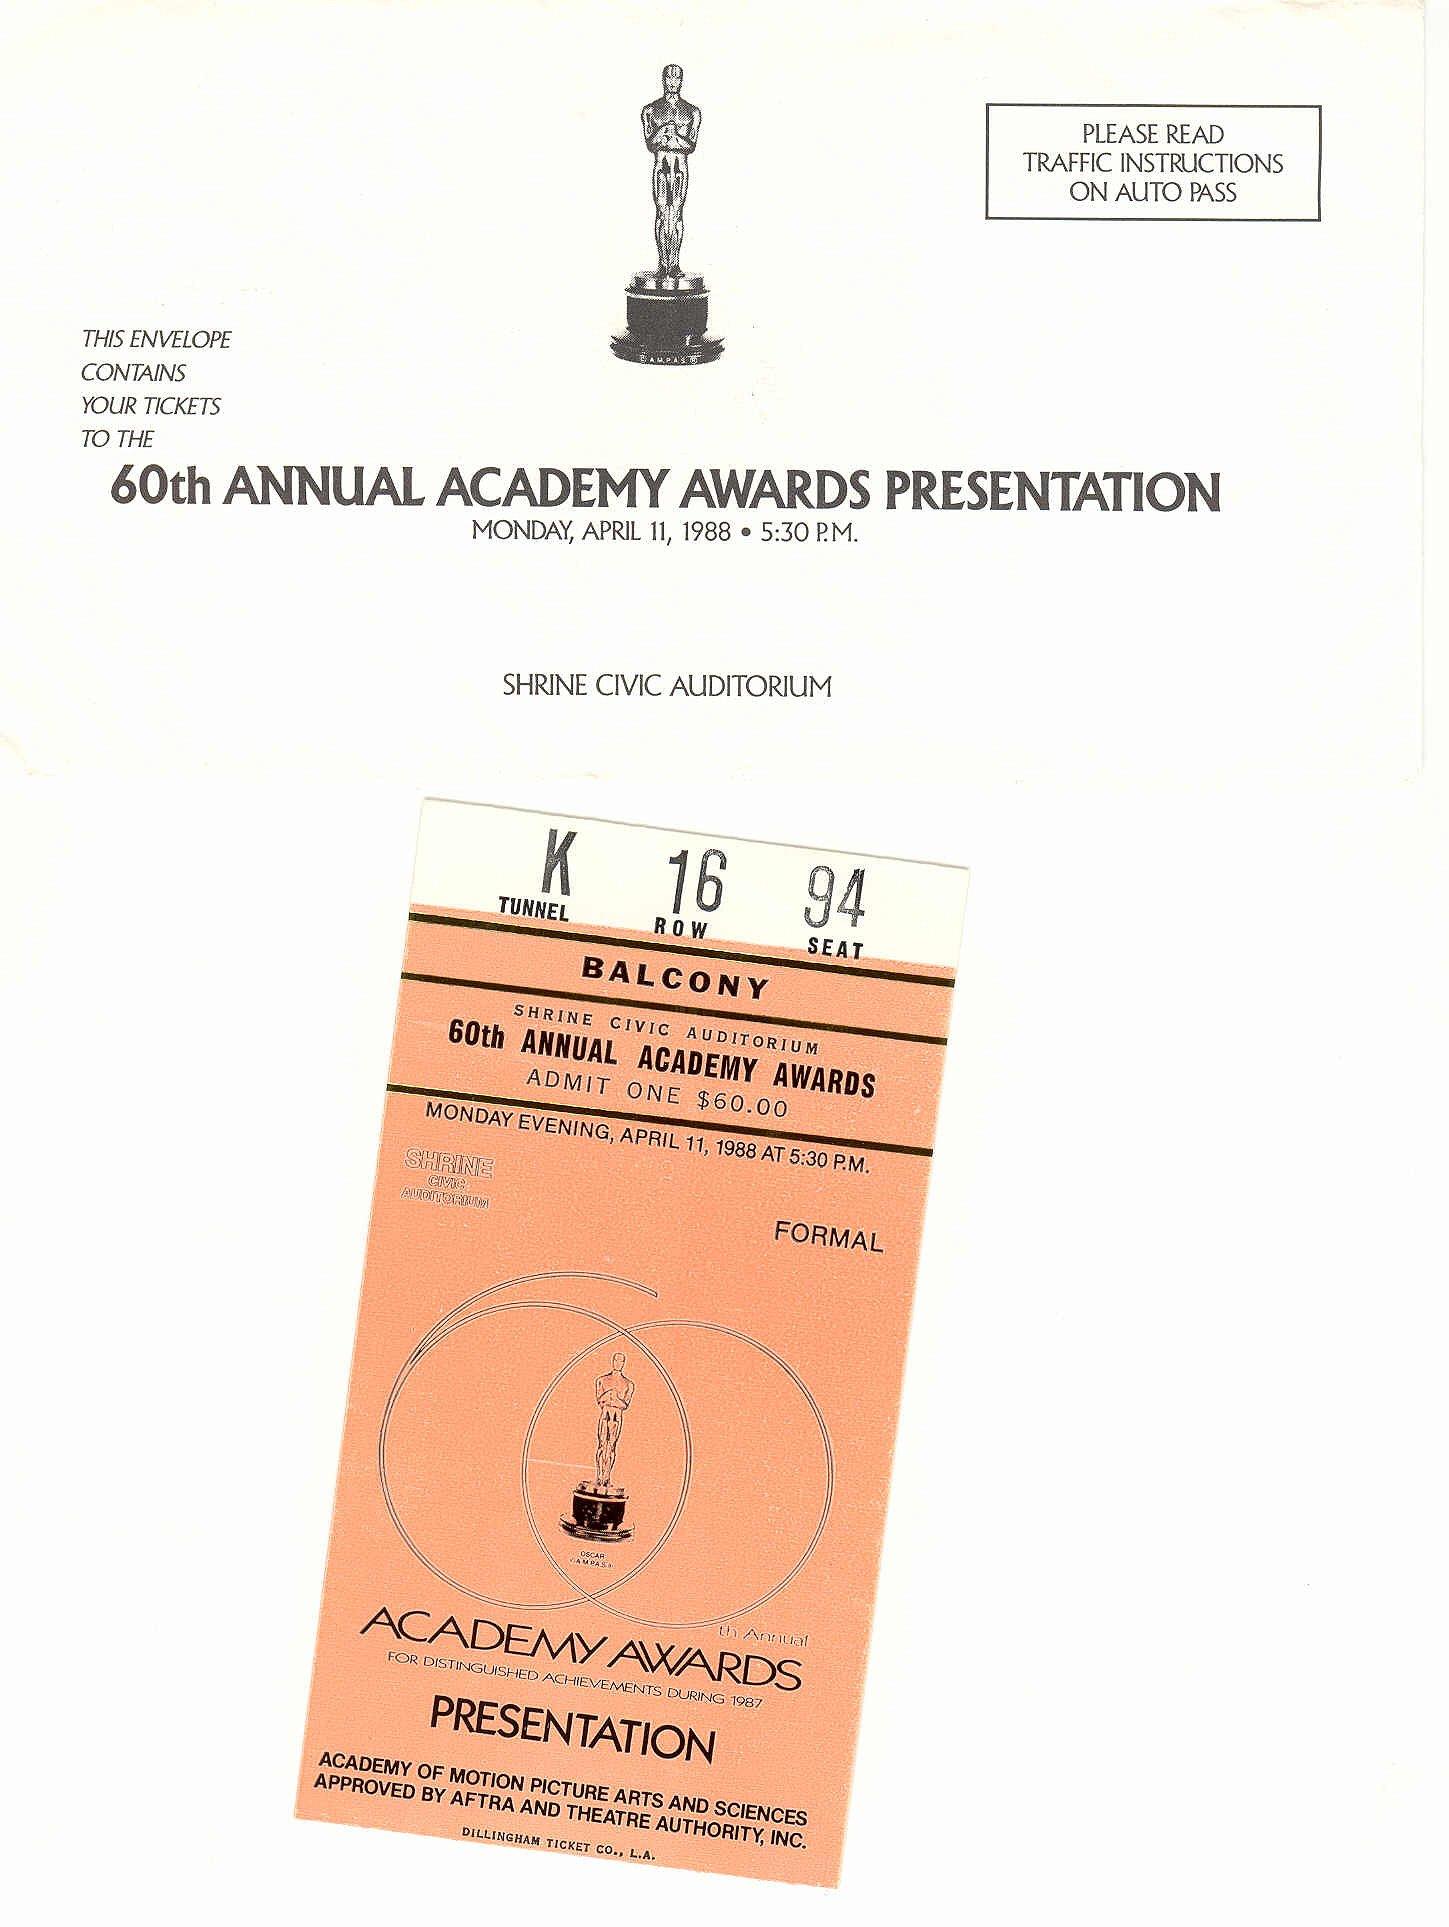 Academy awards wikimedia commons - Academy awards 2017 download ...